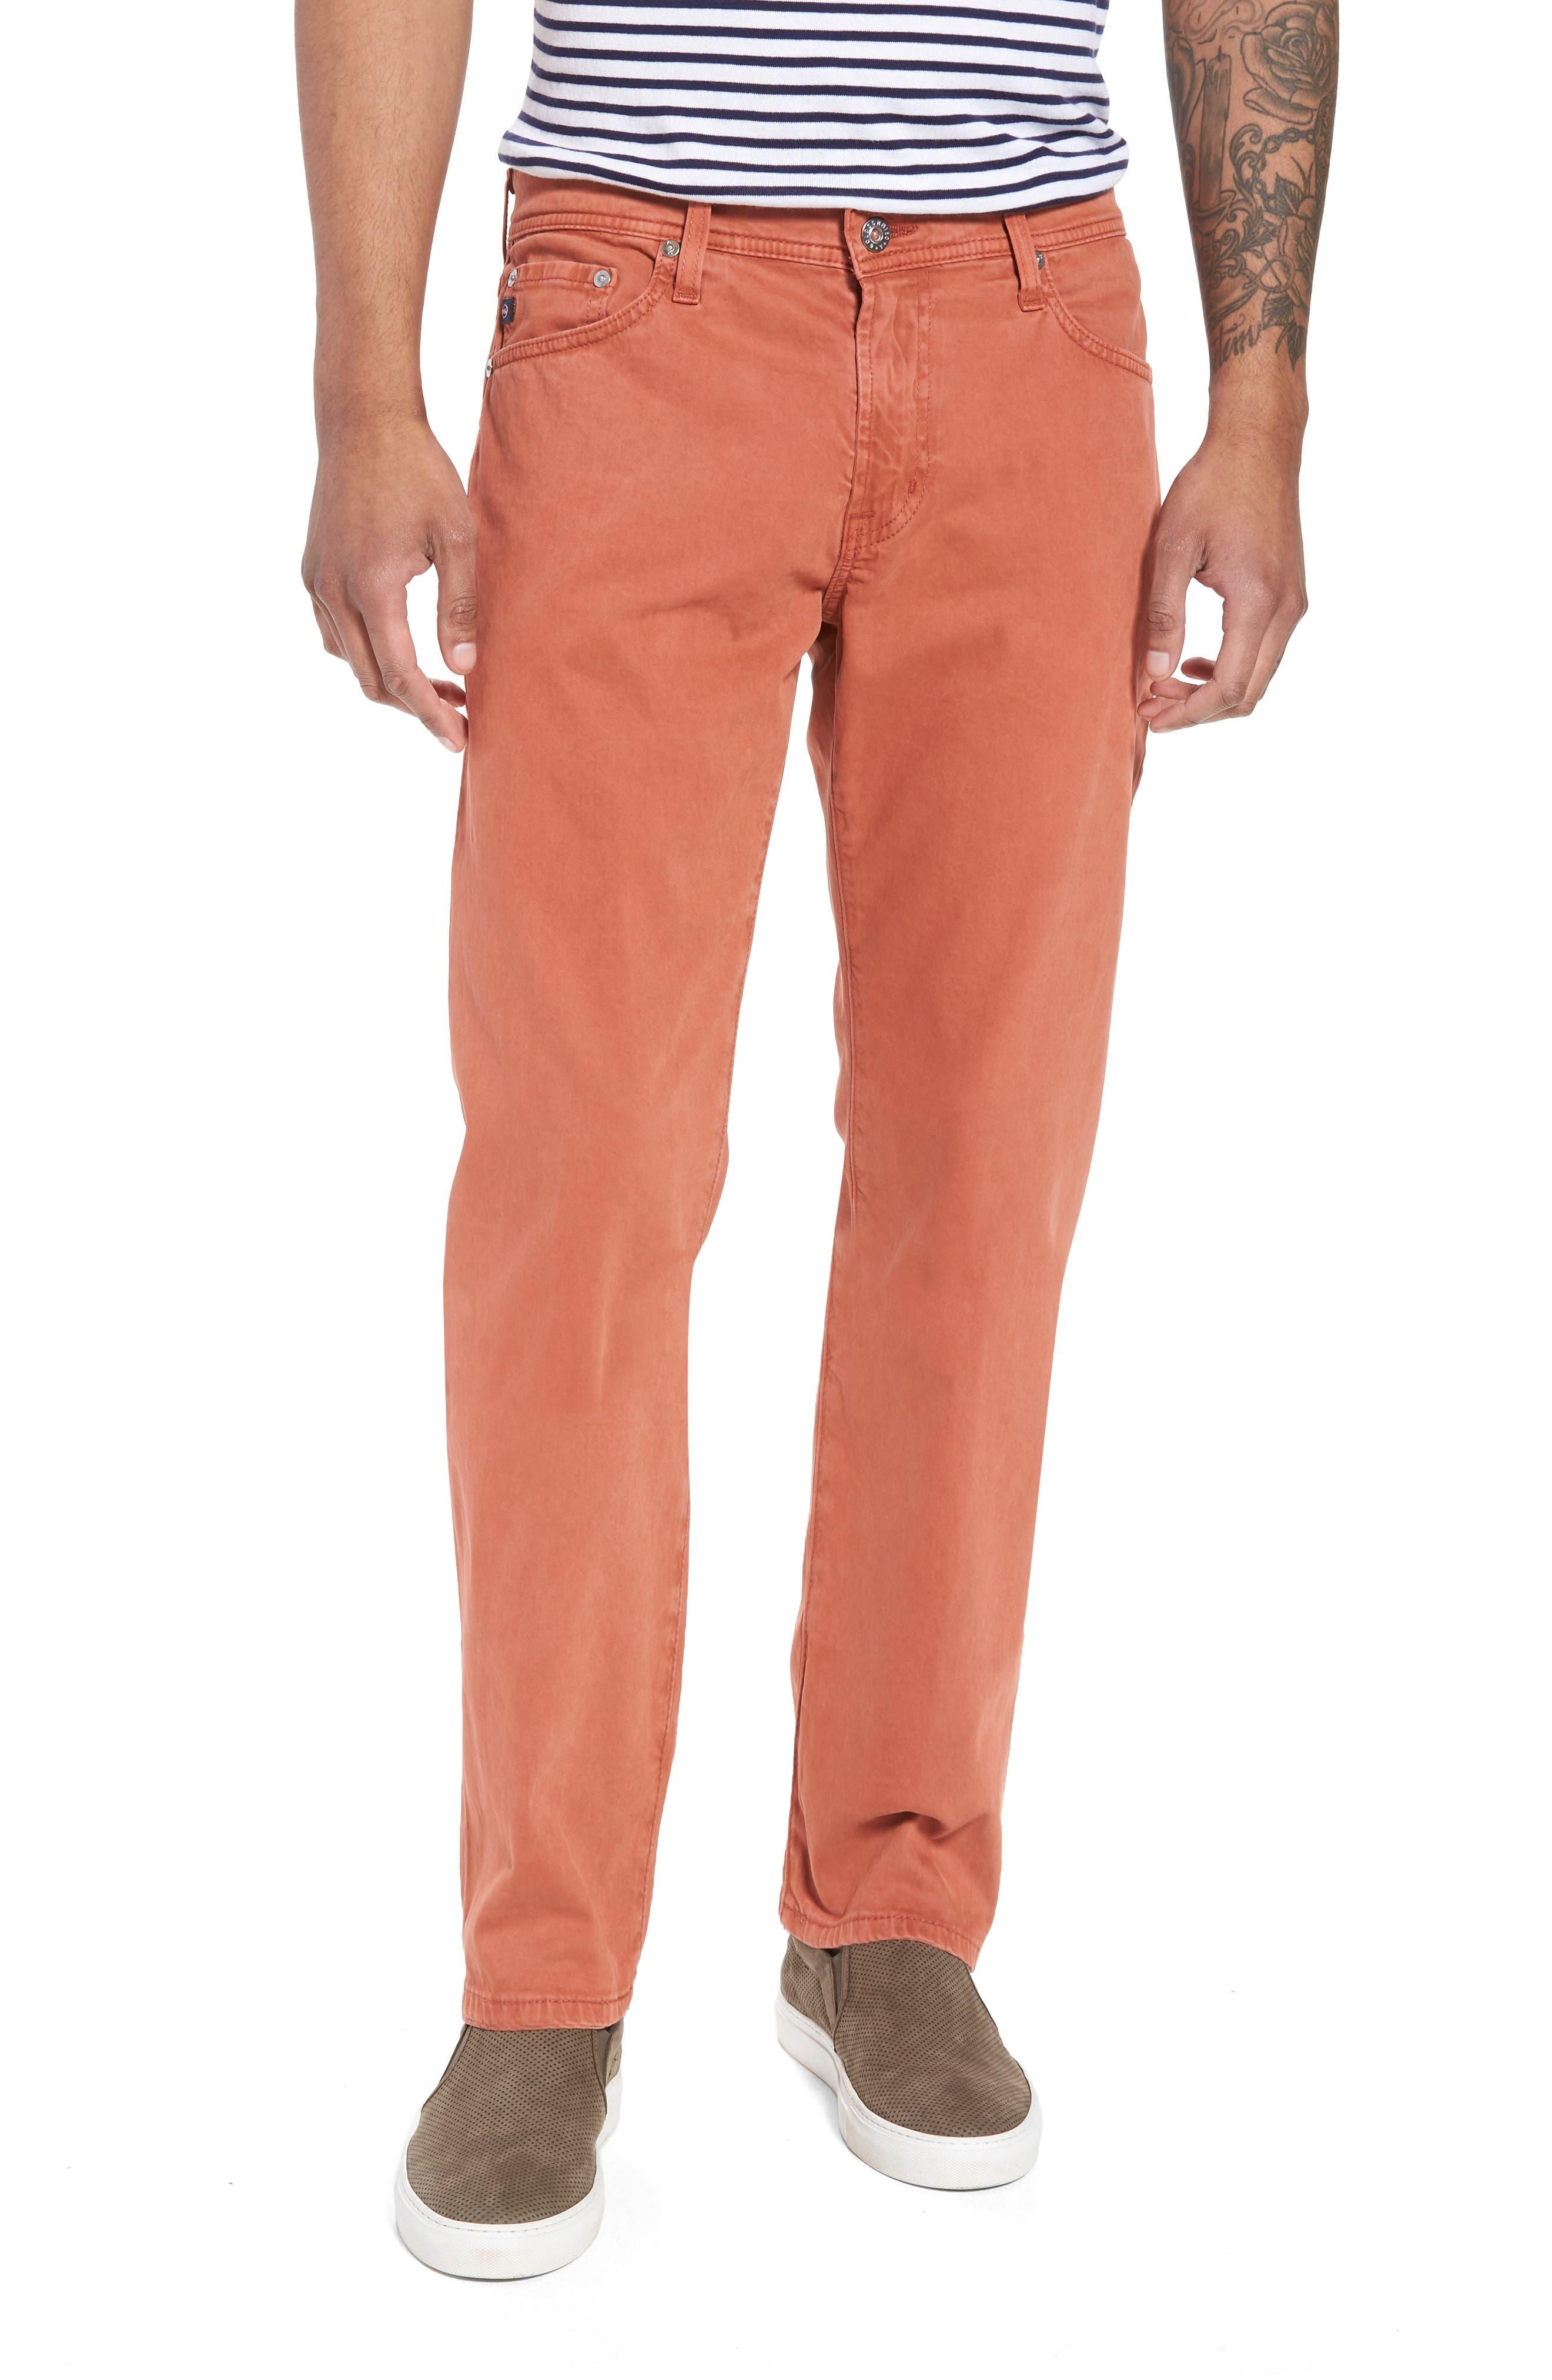 Graduate SUD Slim Straight Leg Pants,                             Main thumbnail 1, color,                             Sulfur Rosso Red